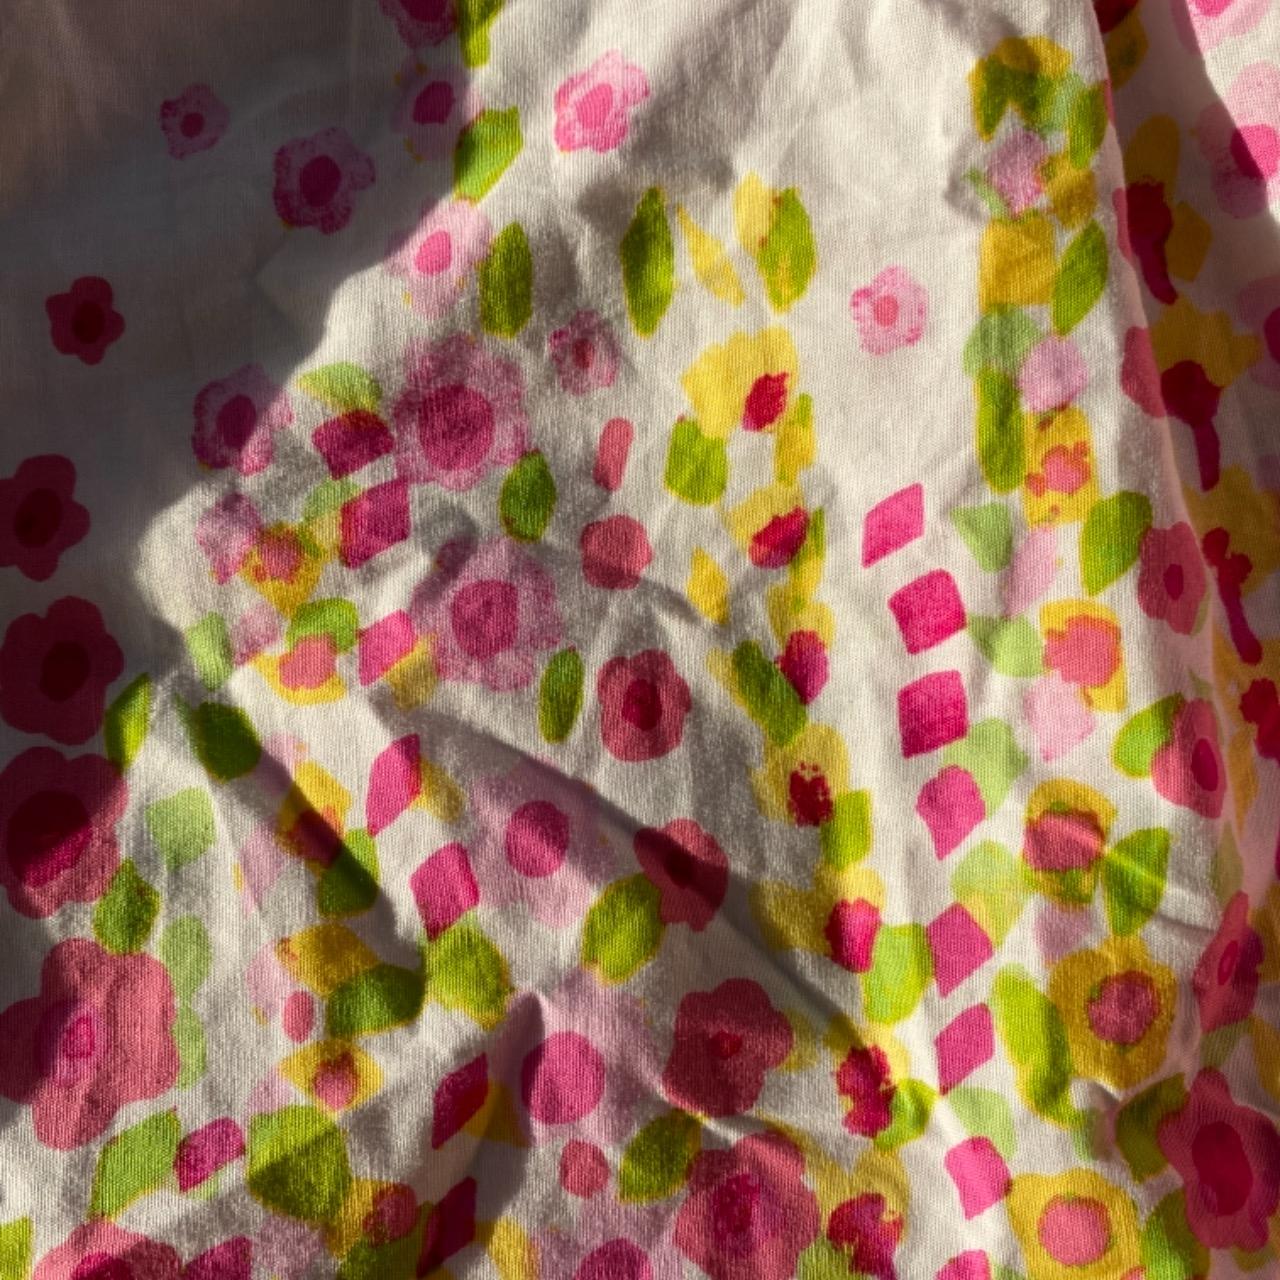 Girls JONA MICHELLE Sweet Summer dress Size 4  Green/Pink /White/Yellow Floral